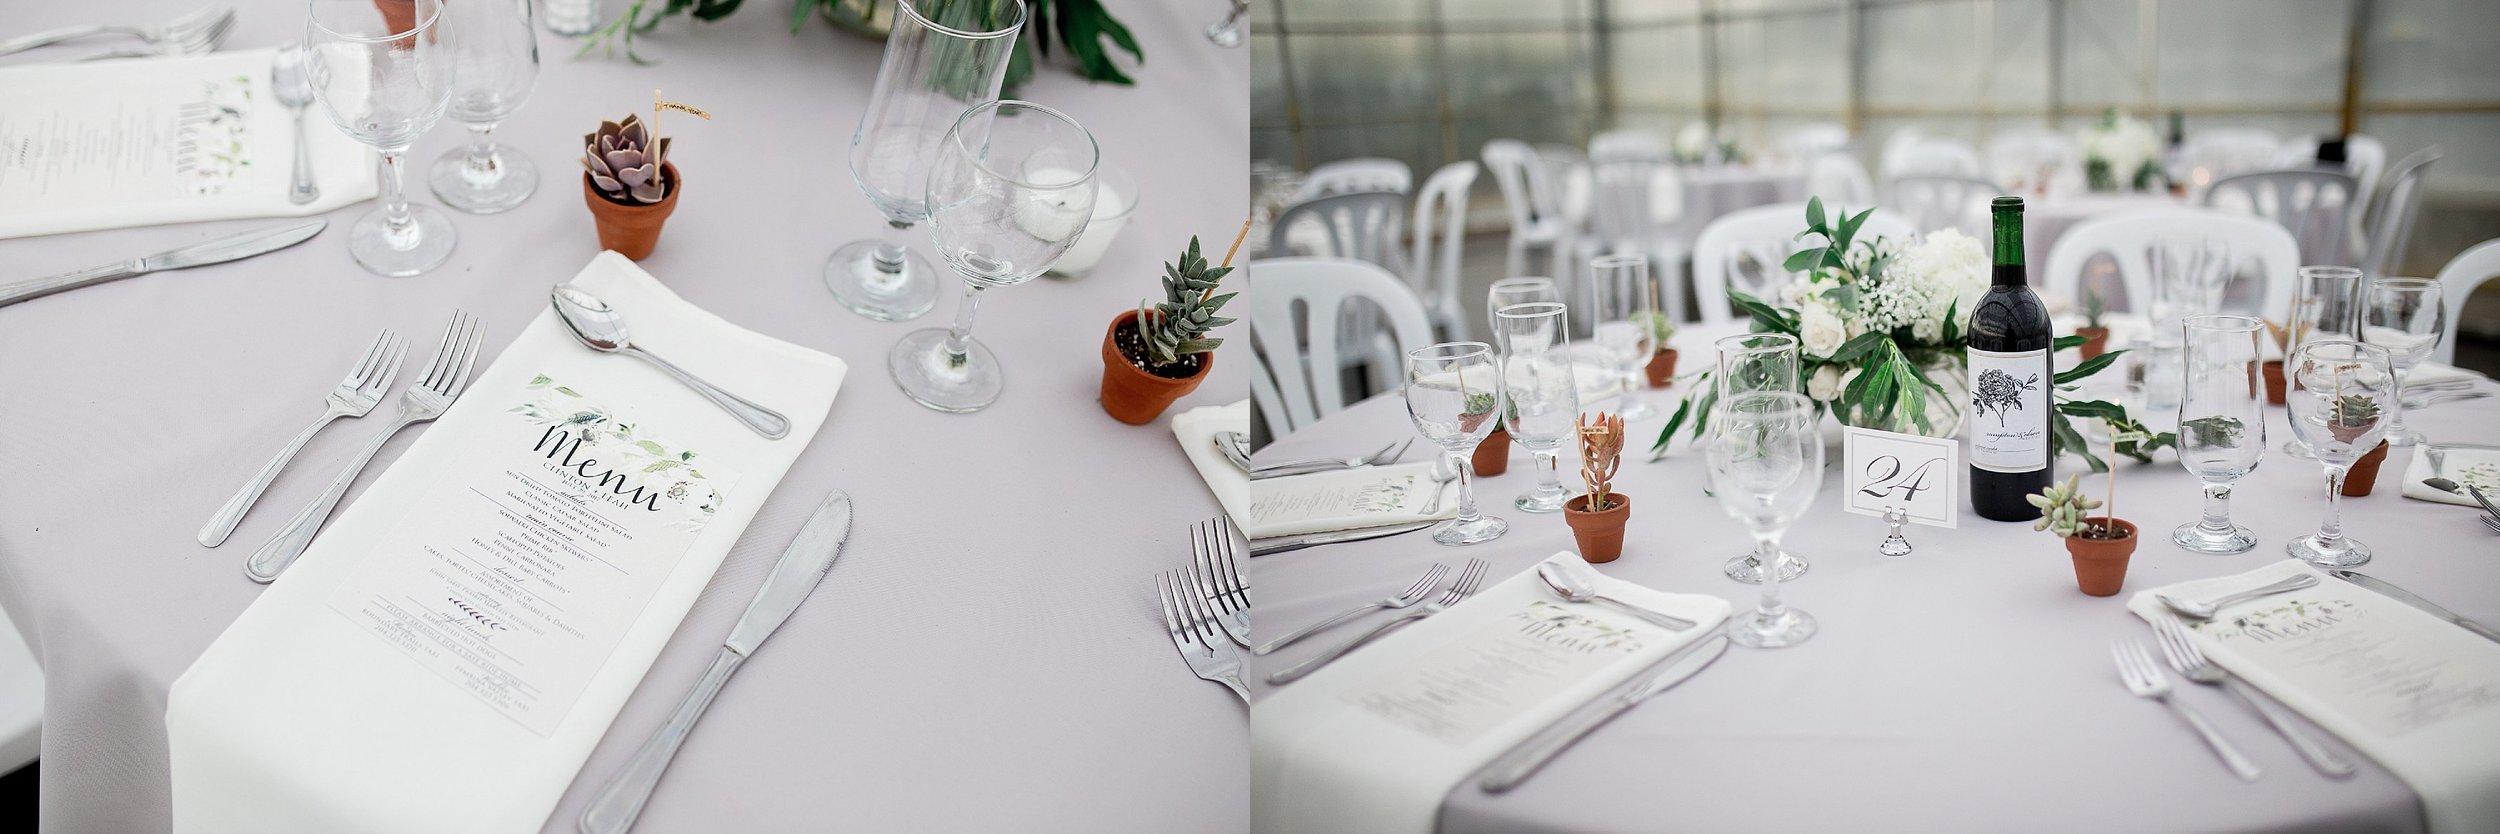 Greenhouse wedding reception   Reception ideas   Keila Marie Photography   Manitoba Wedding Photographer